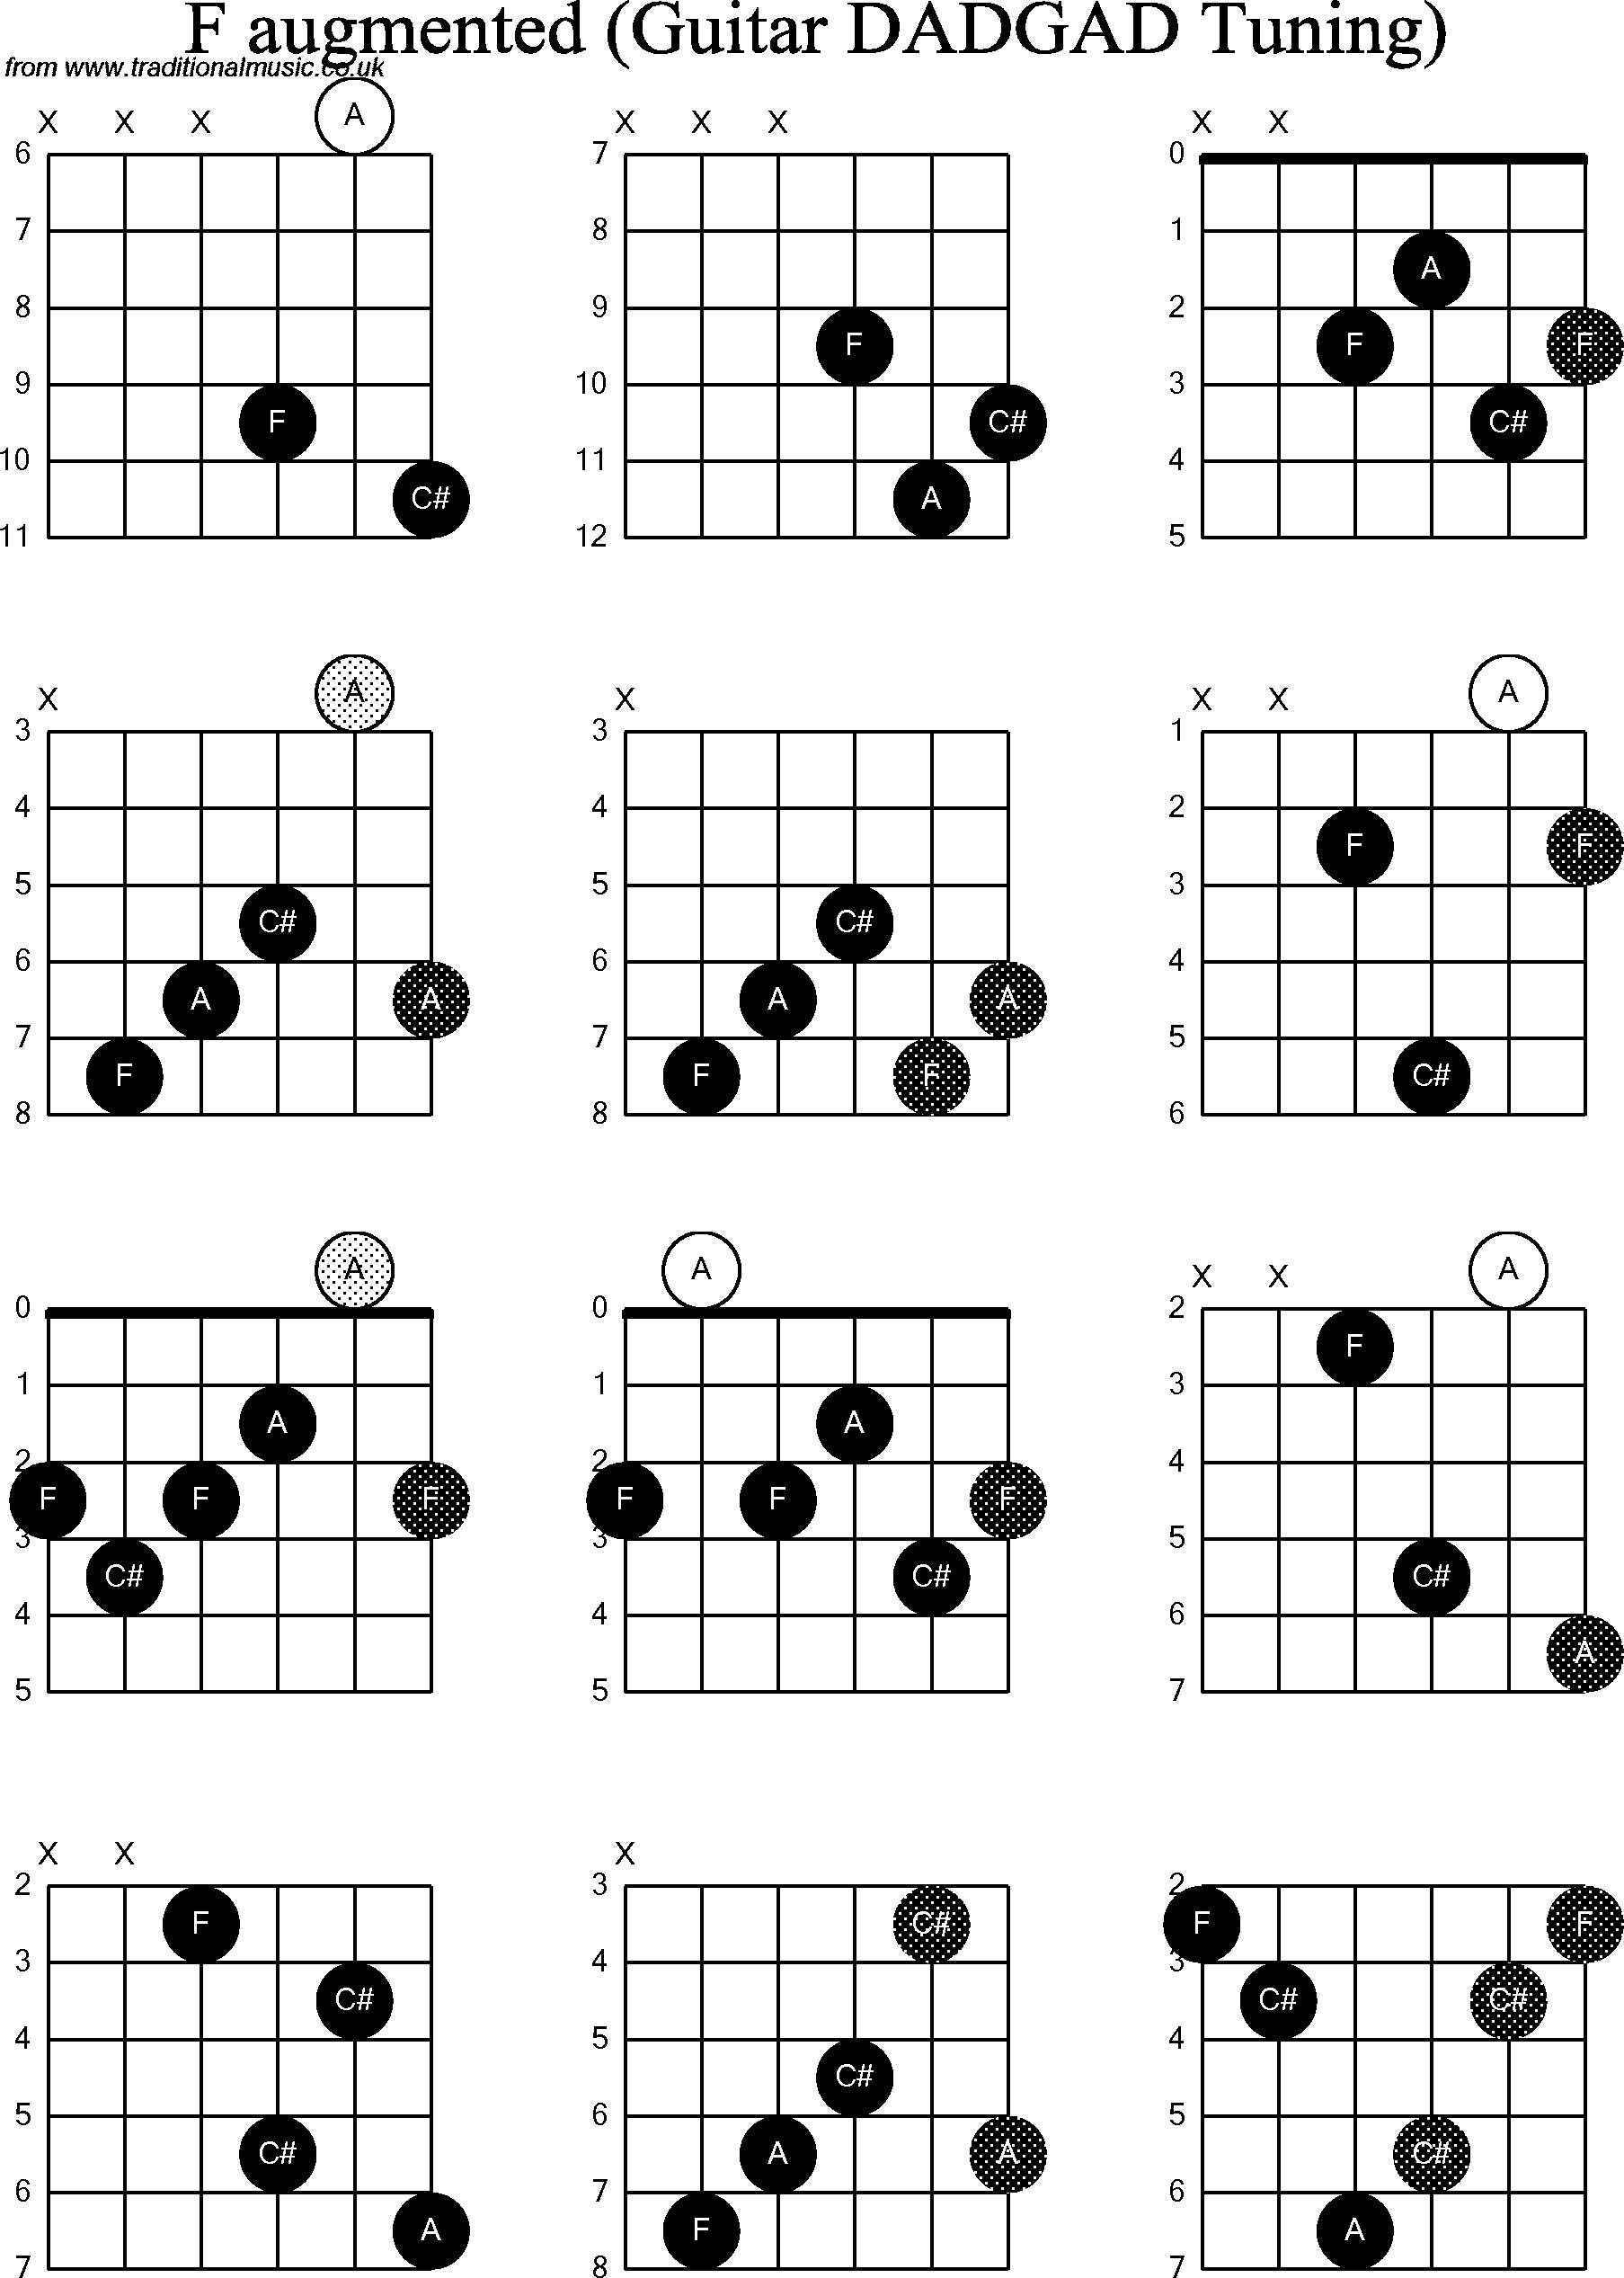 Chord diagrams D Modal Guitar( DADGAD): F Augmented